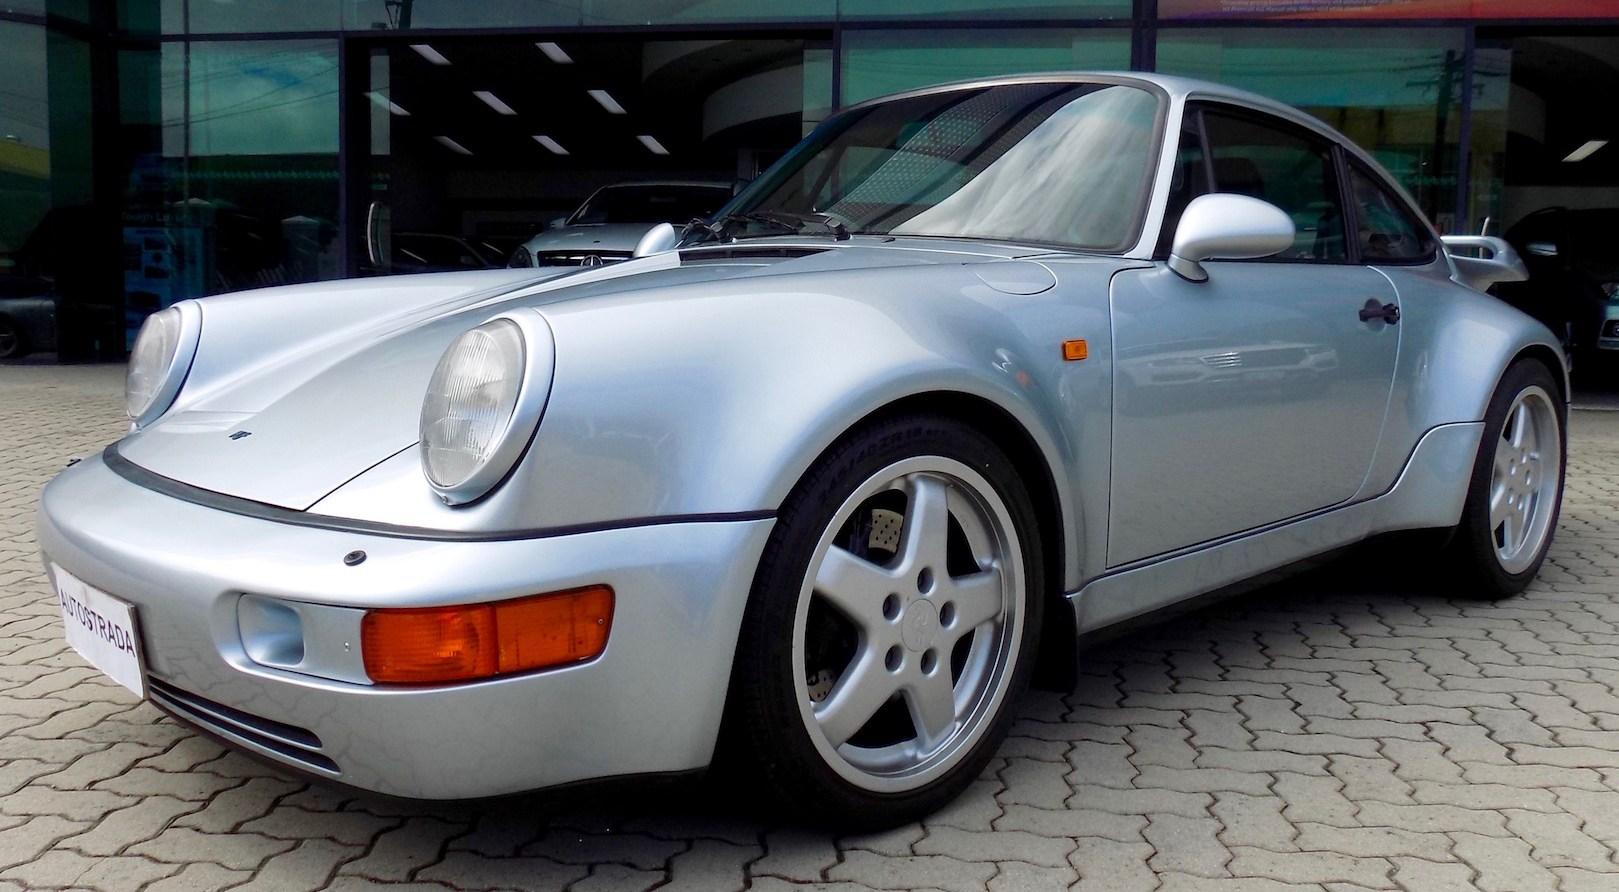 Porsche 964 RUF BTR4 for sale